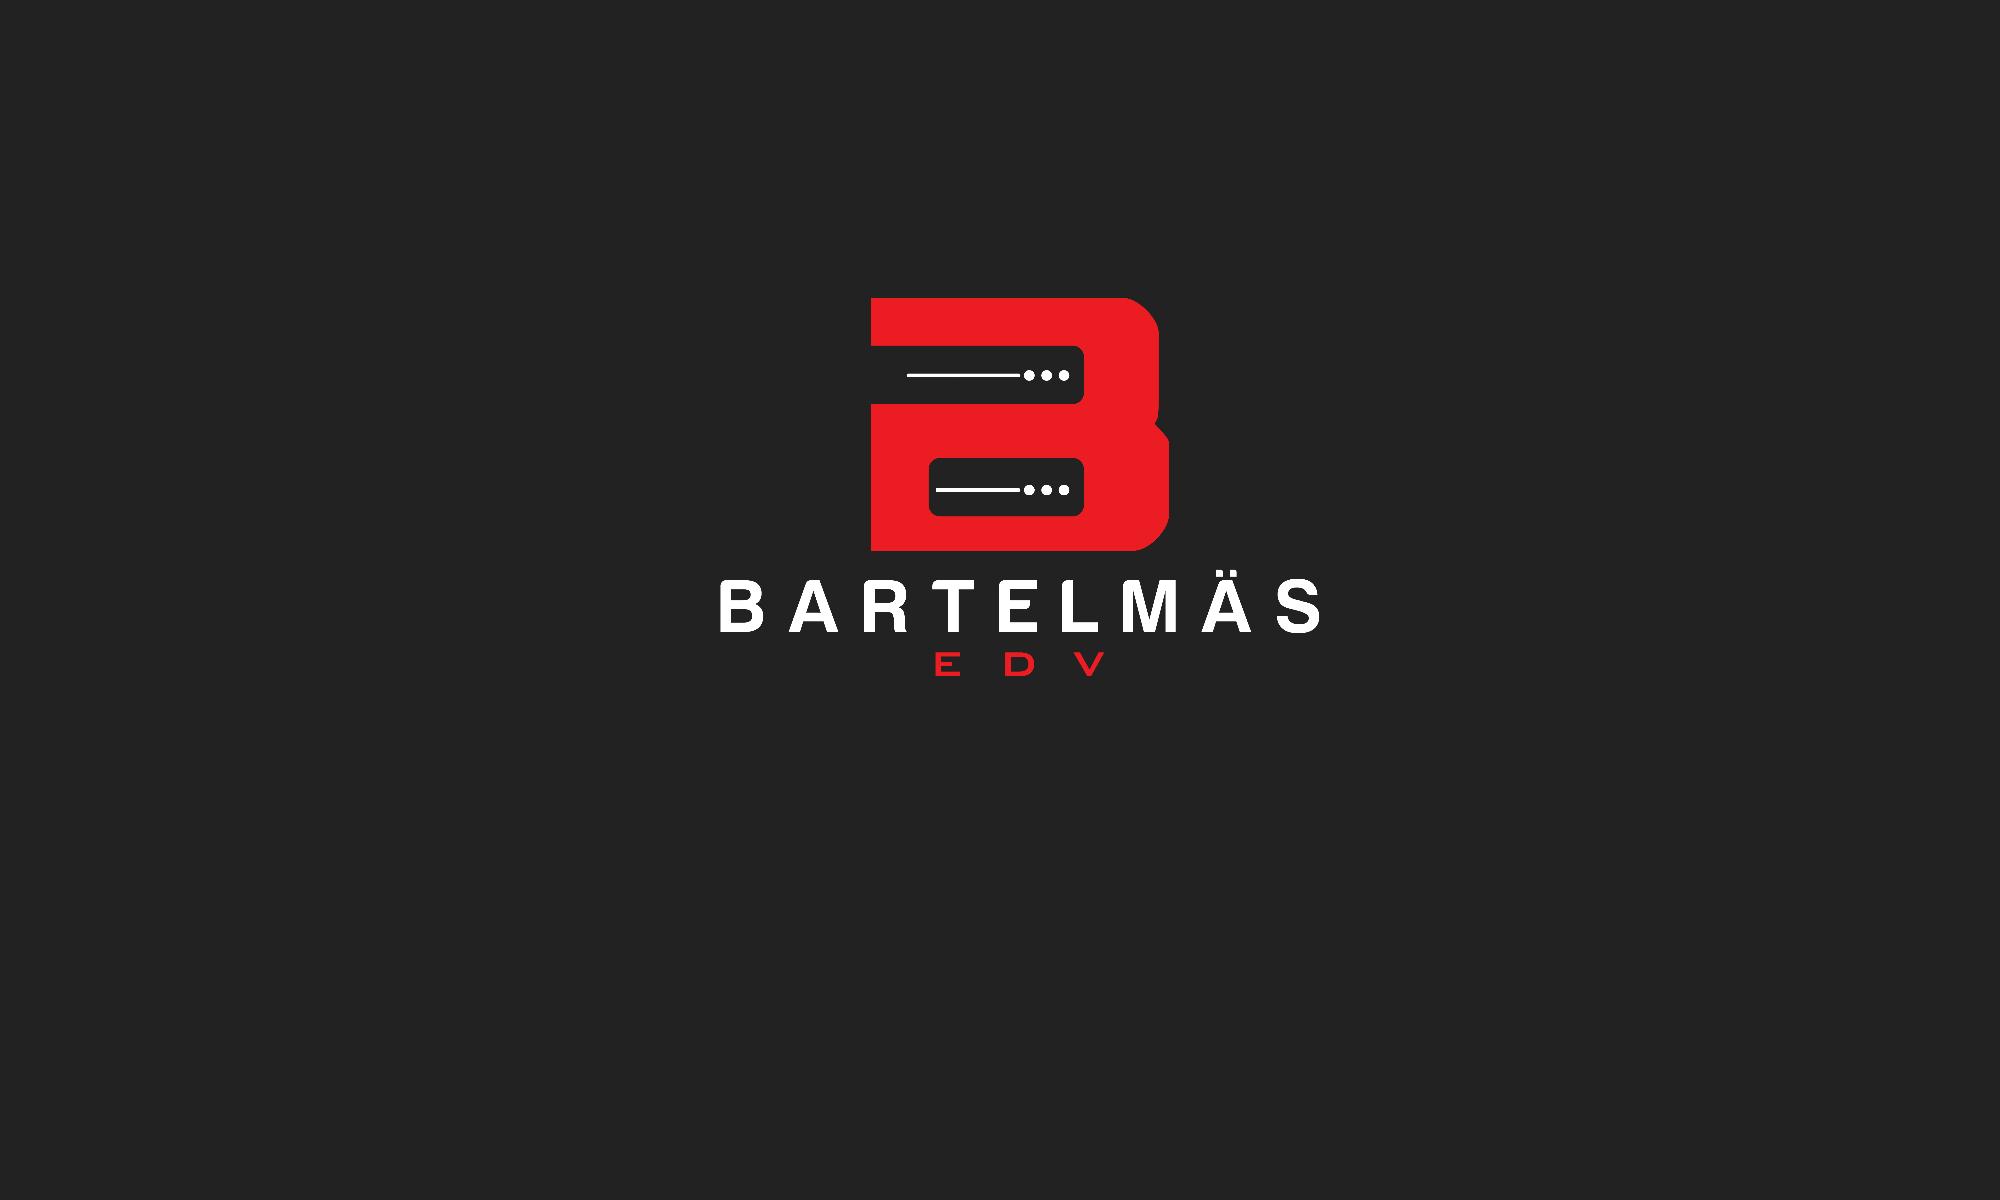 Bartelmäs-EDV